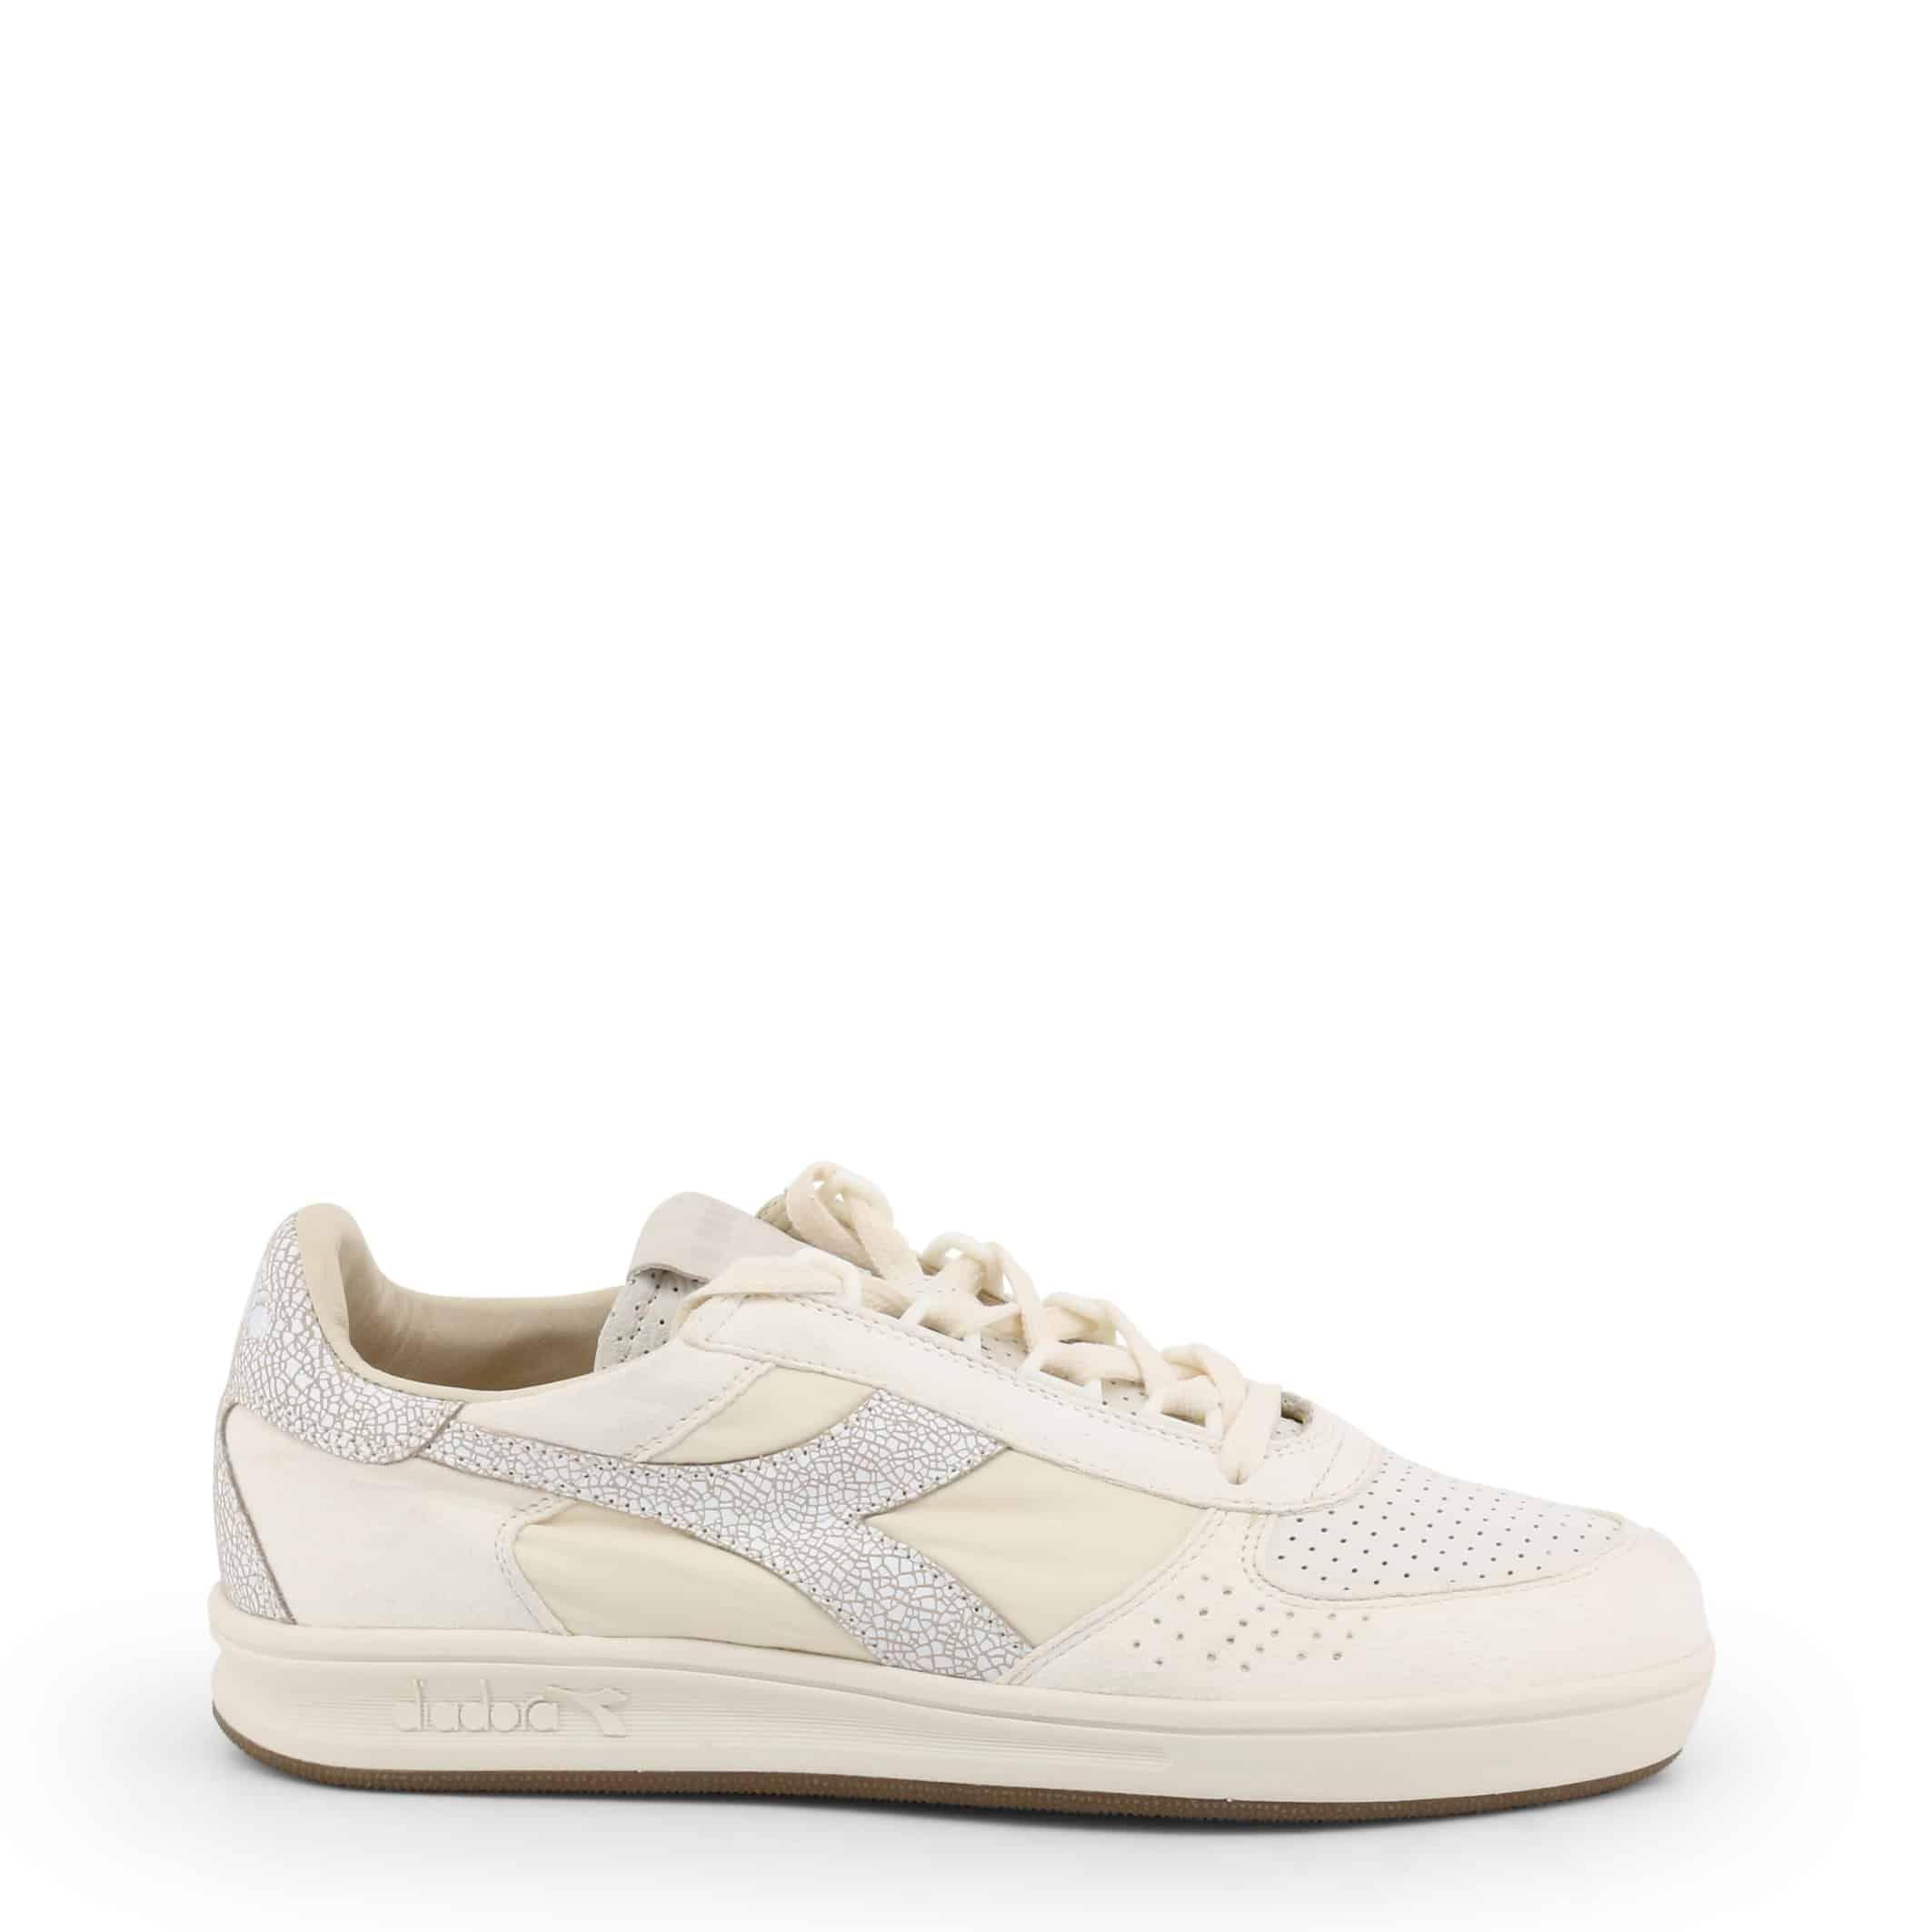 Schuhe Diadora Heritage – B_ELITE_ITA_WHITEPACK – Weiß